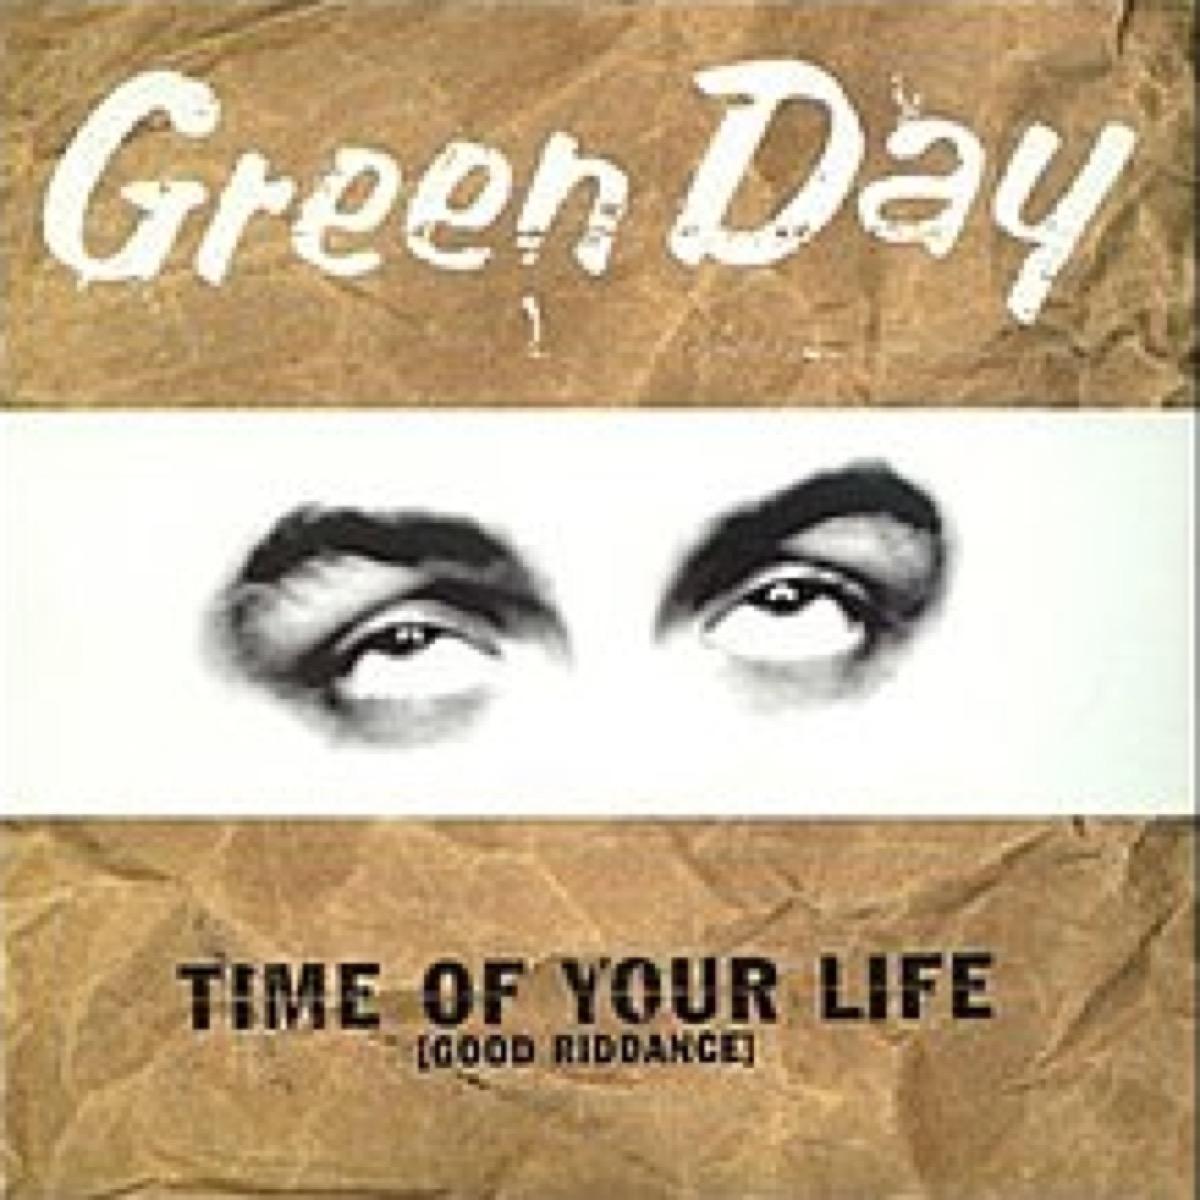 """good riddance"" by green day"